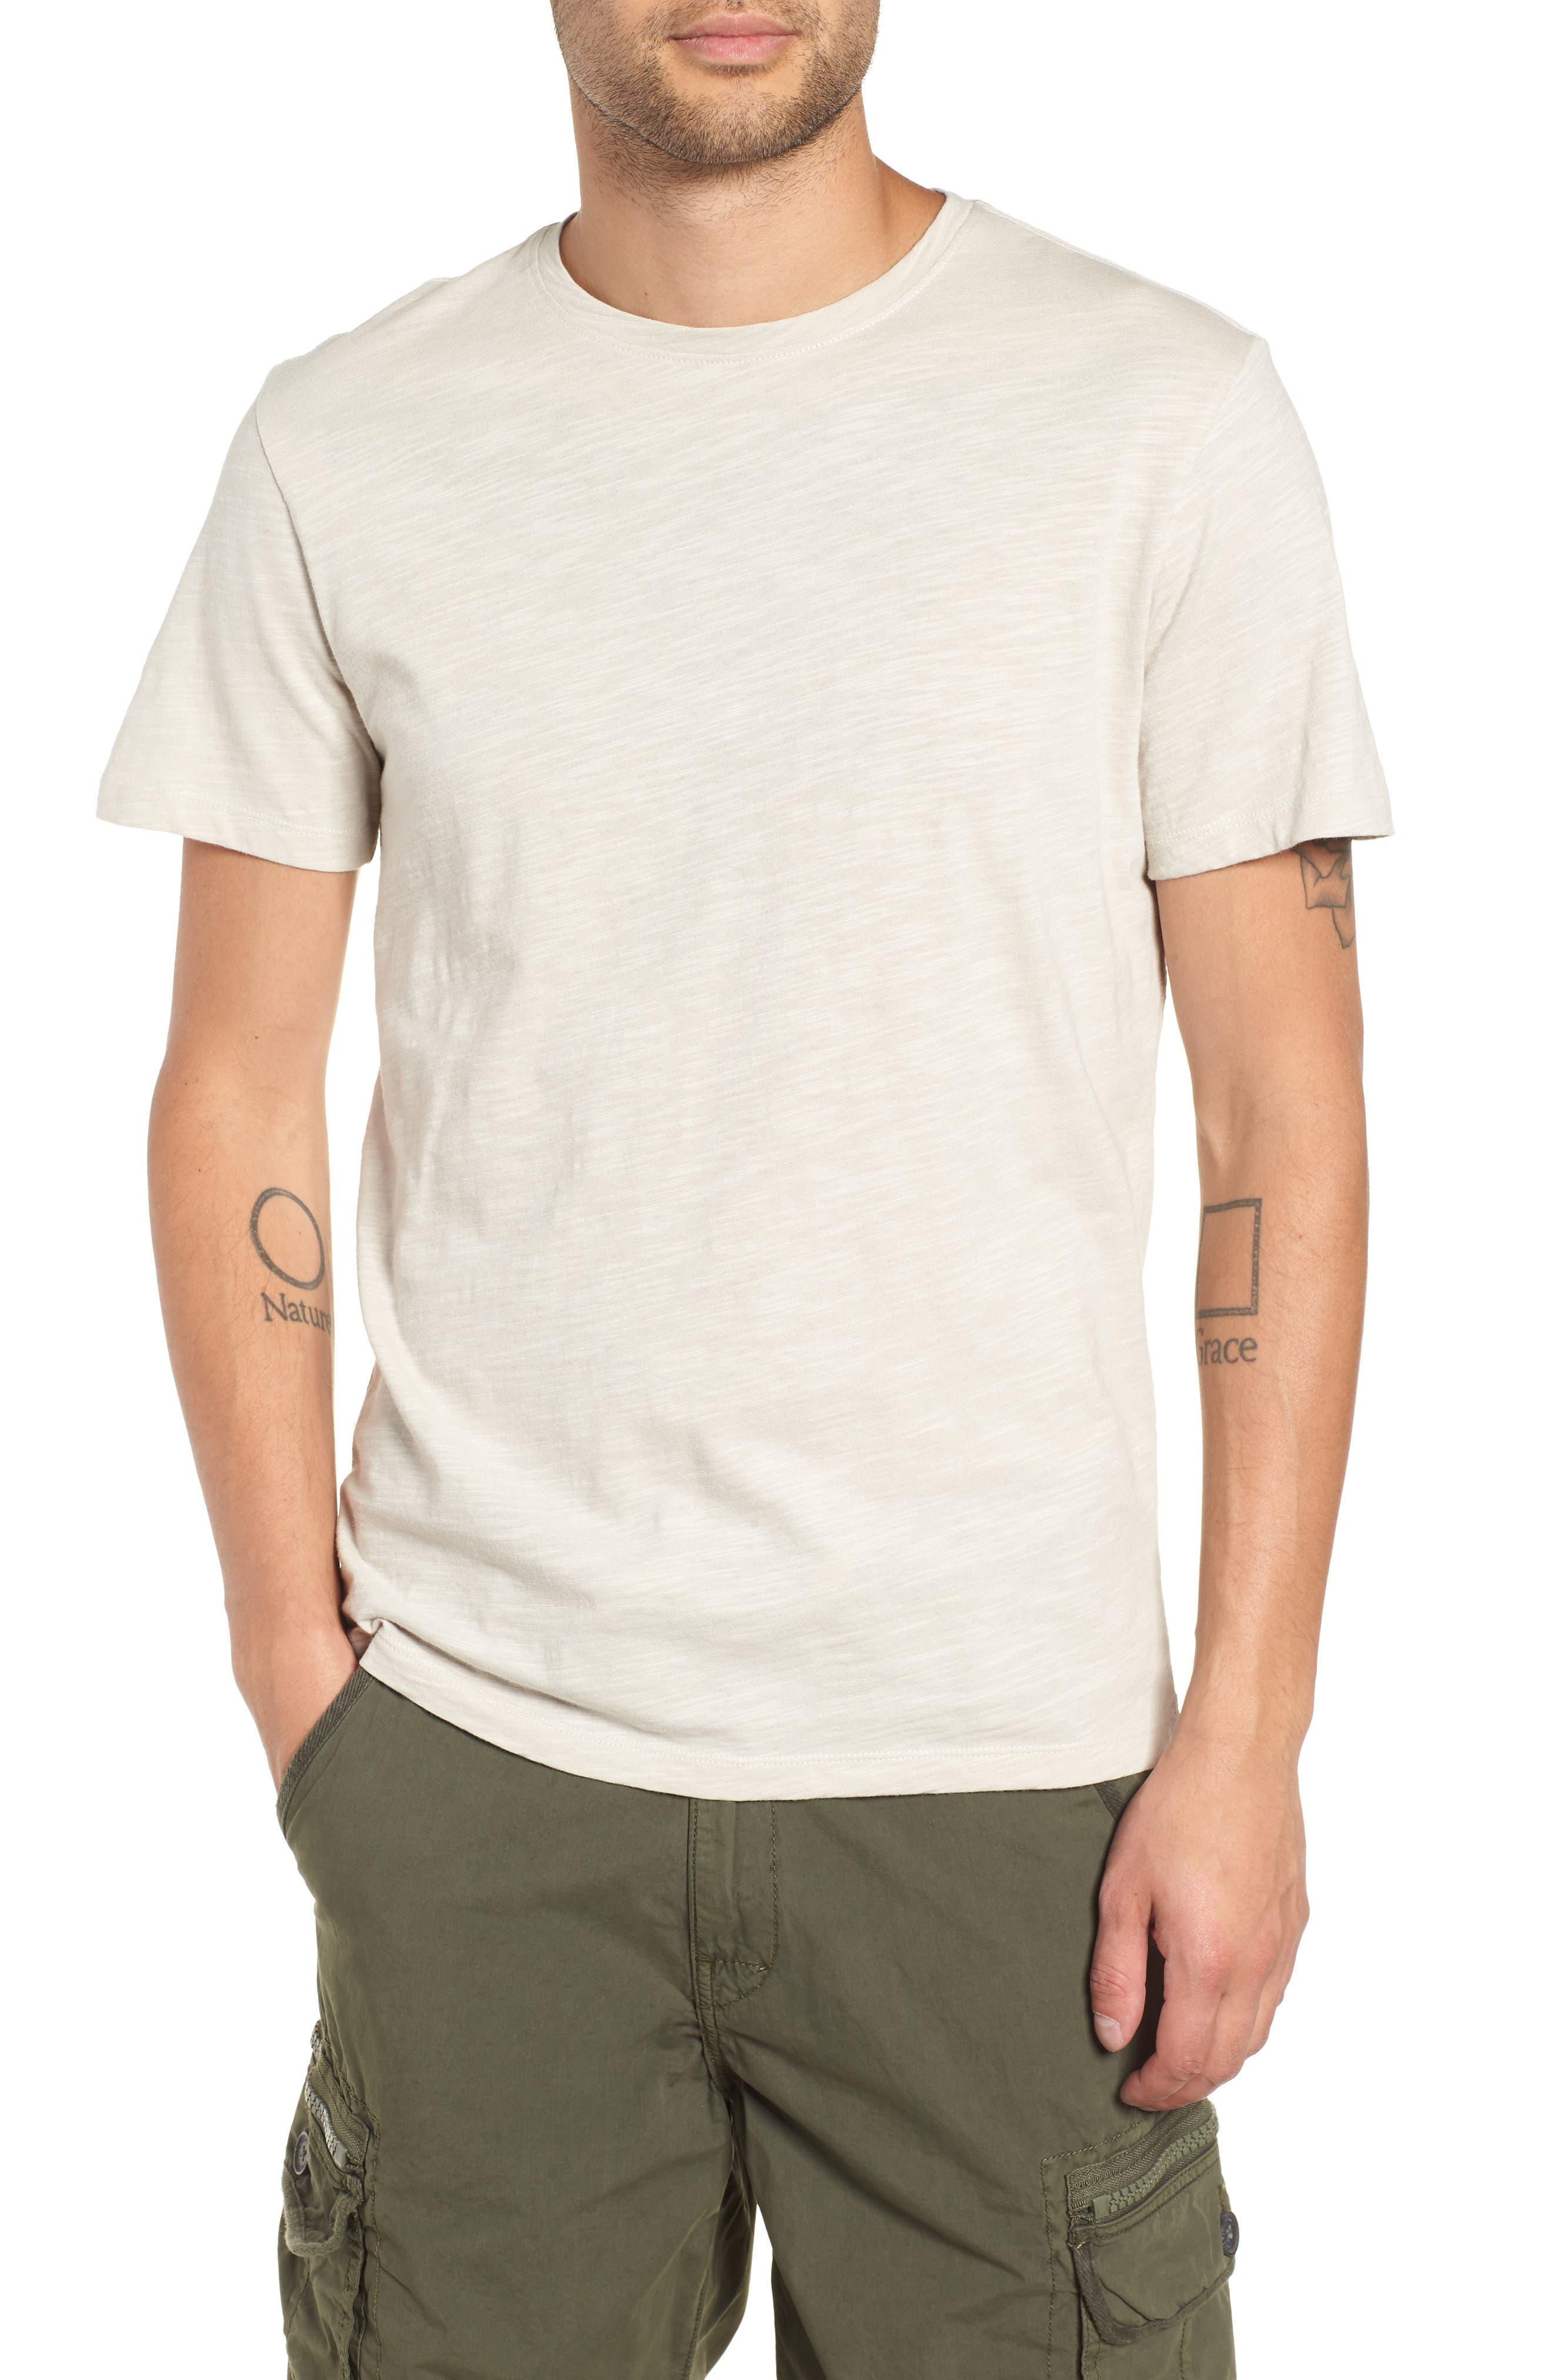 THE RAIL Slub Knit T-Shirt, Main, color, 050